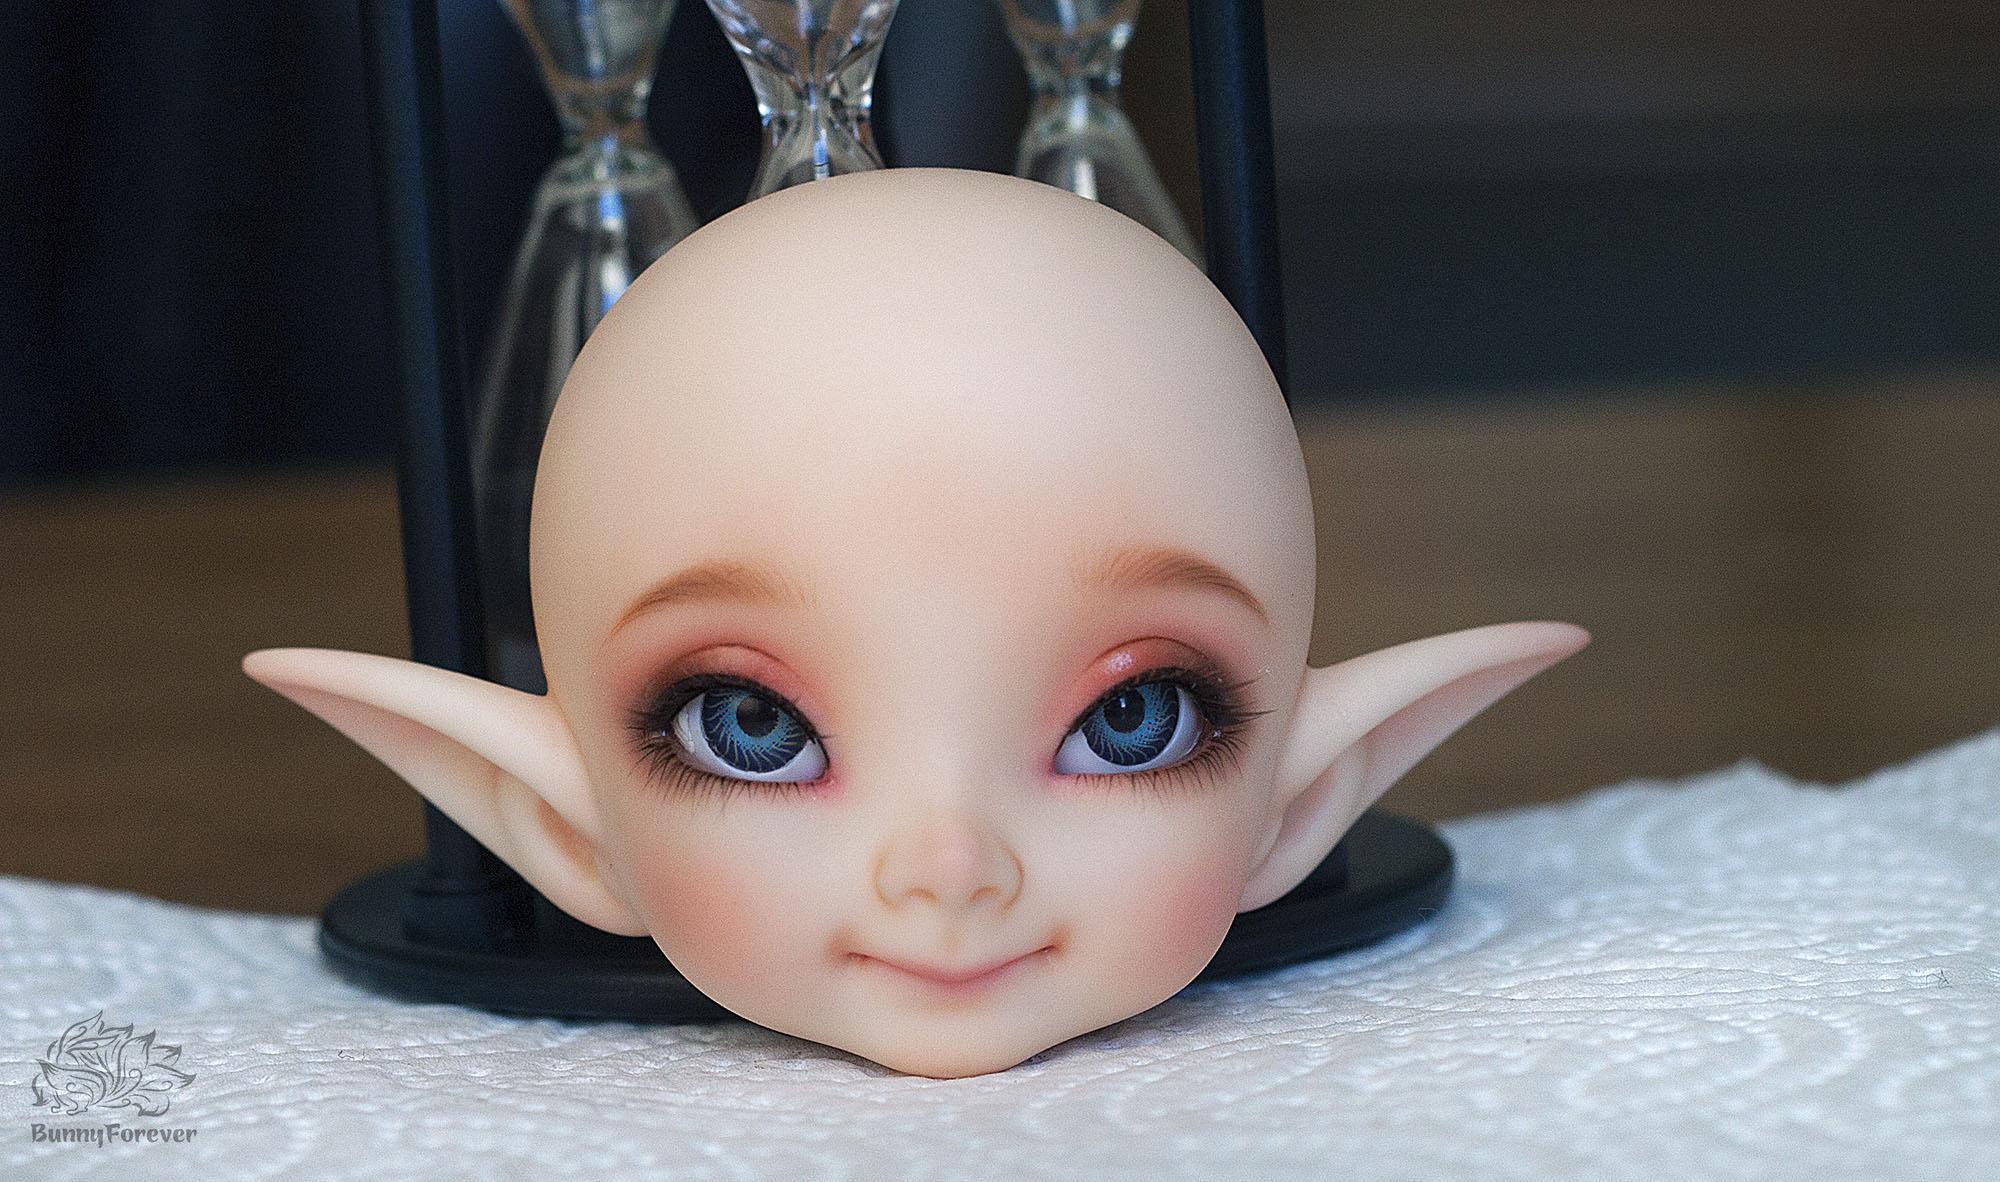 balljointeddoll, ball jointed doll, bjd, bjd doll, face-up, faceup, face-up bjd, faceup bjd. faceup commission, face-up commission, búp bê bjd, bjddoll, balljointdoll, soso, fairylandbjd, realfee